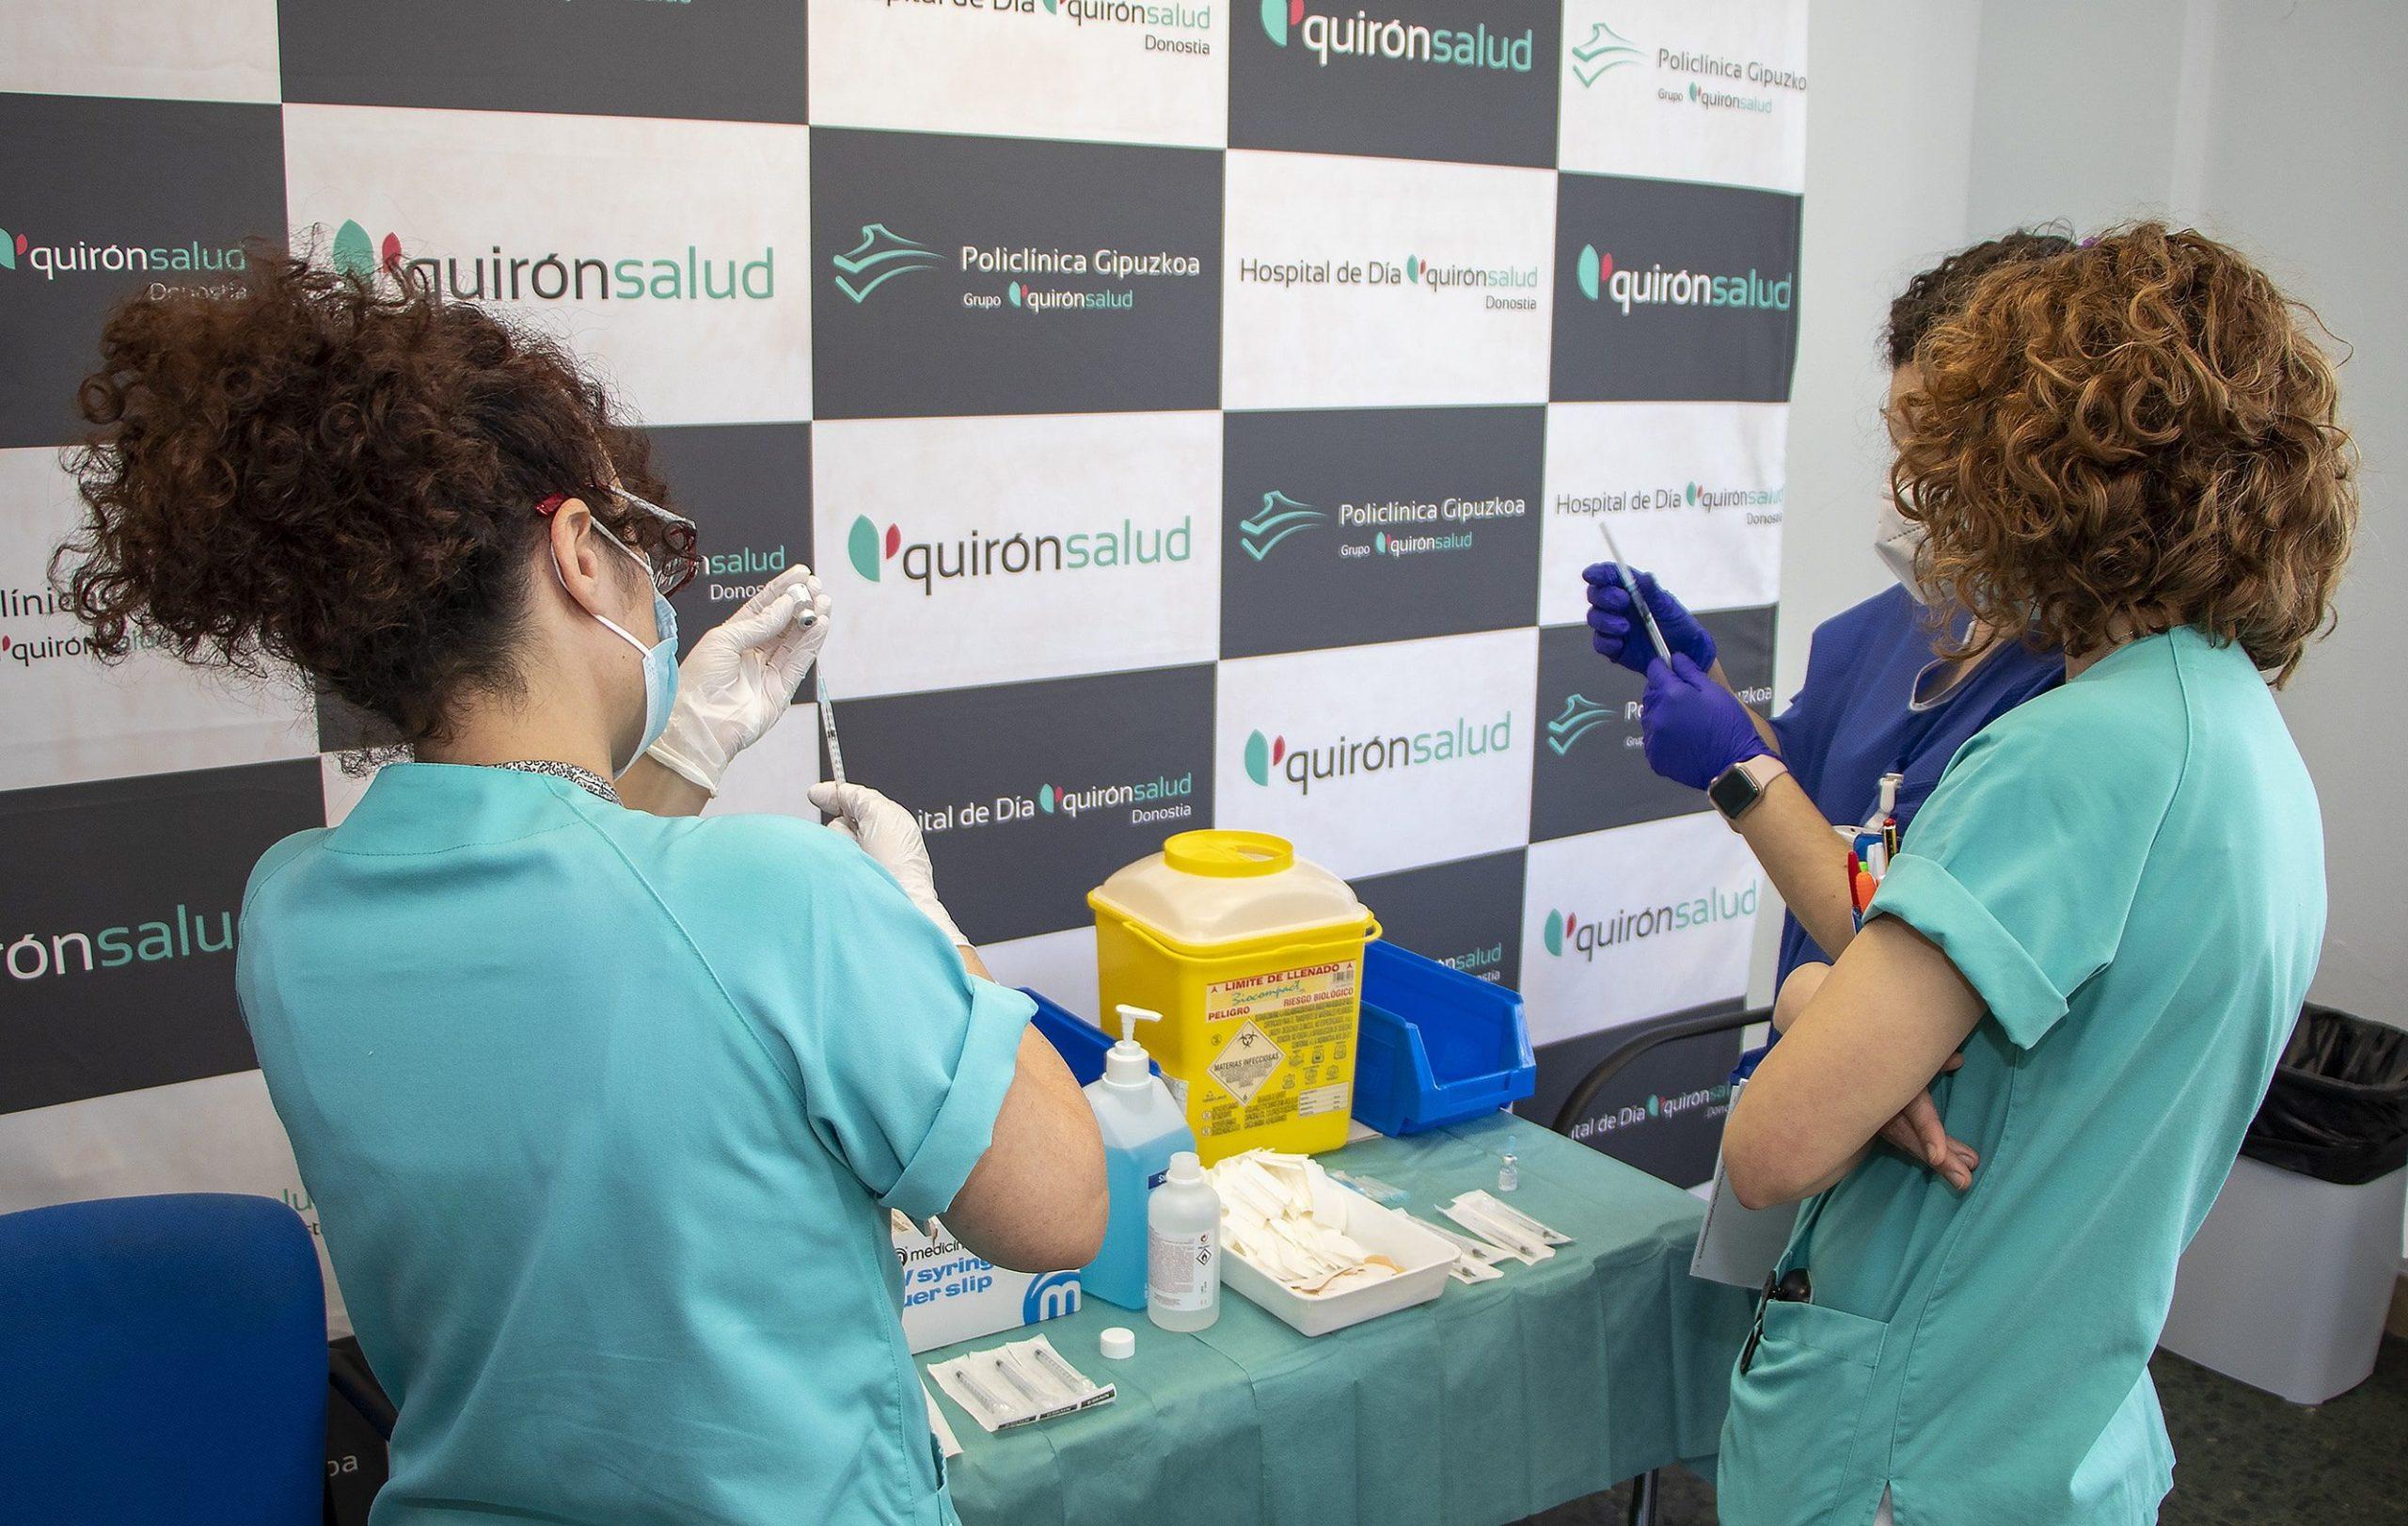 Primera dosis de la vacuna de Pfizer a 150 profesionales en Policlínica Gipuzkoa